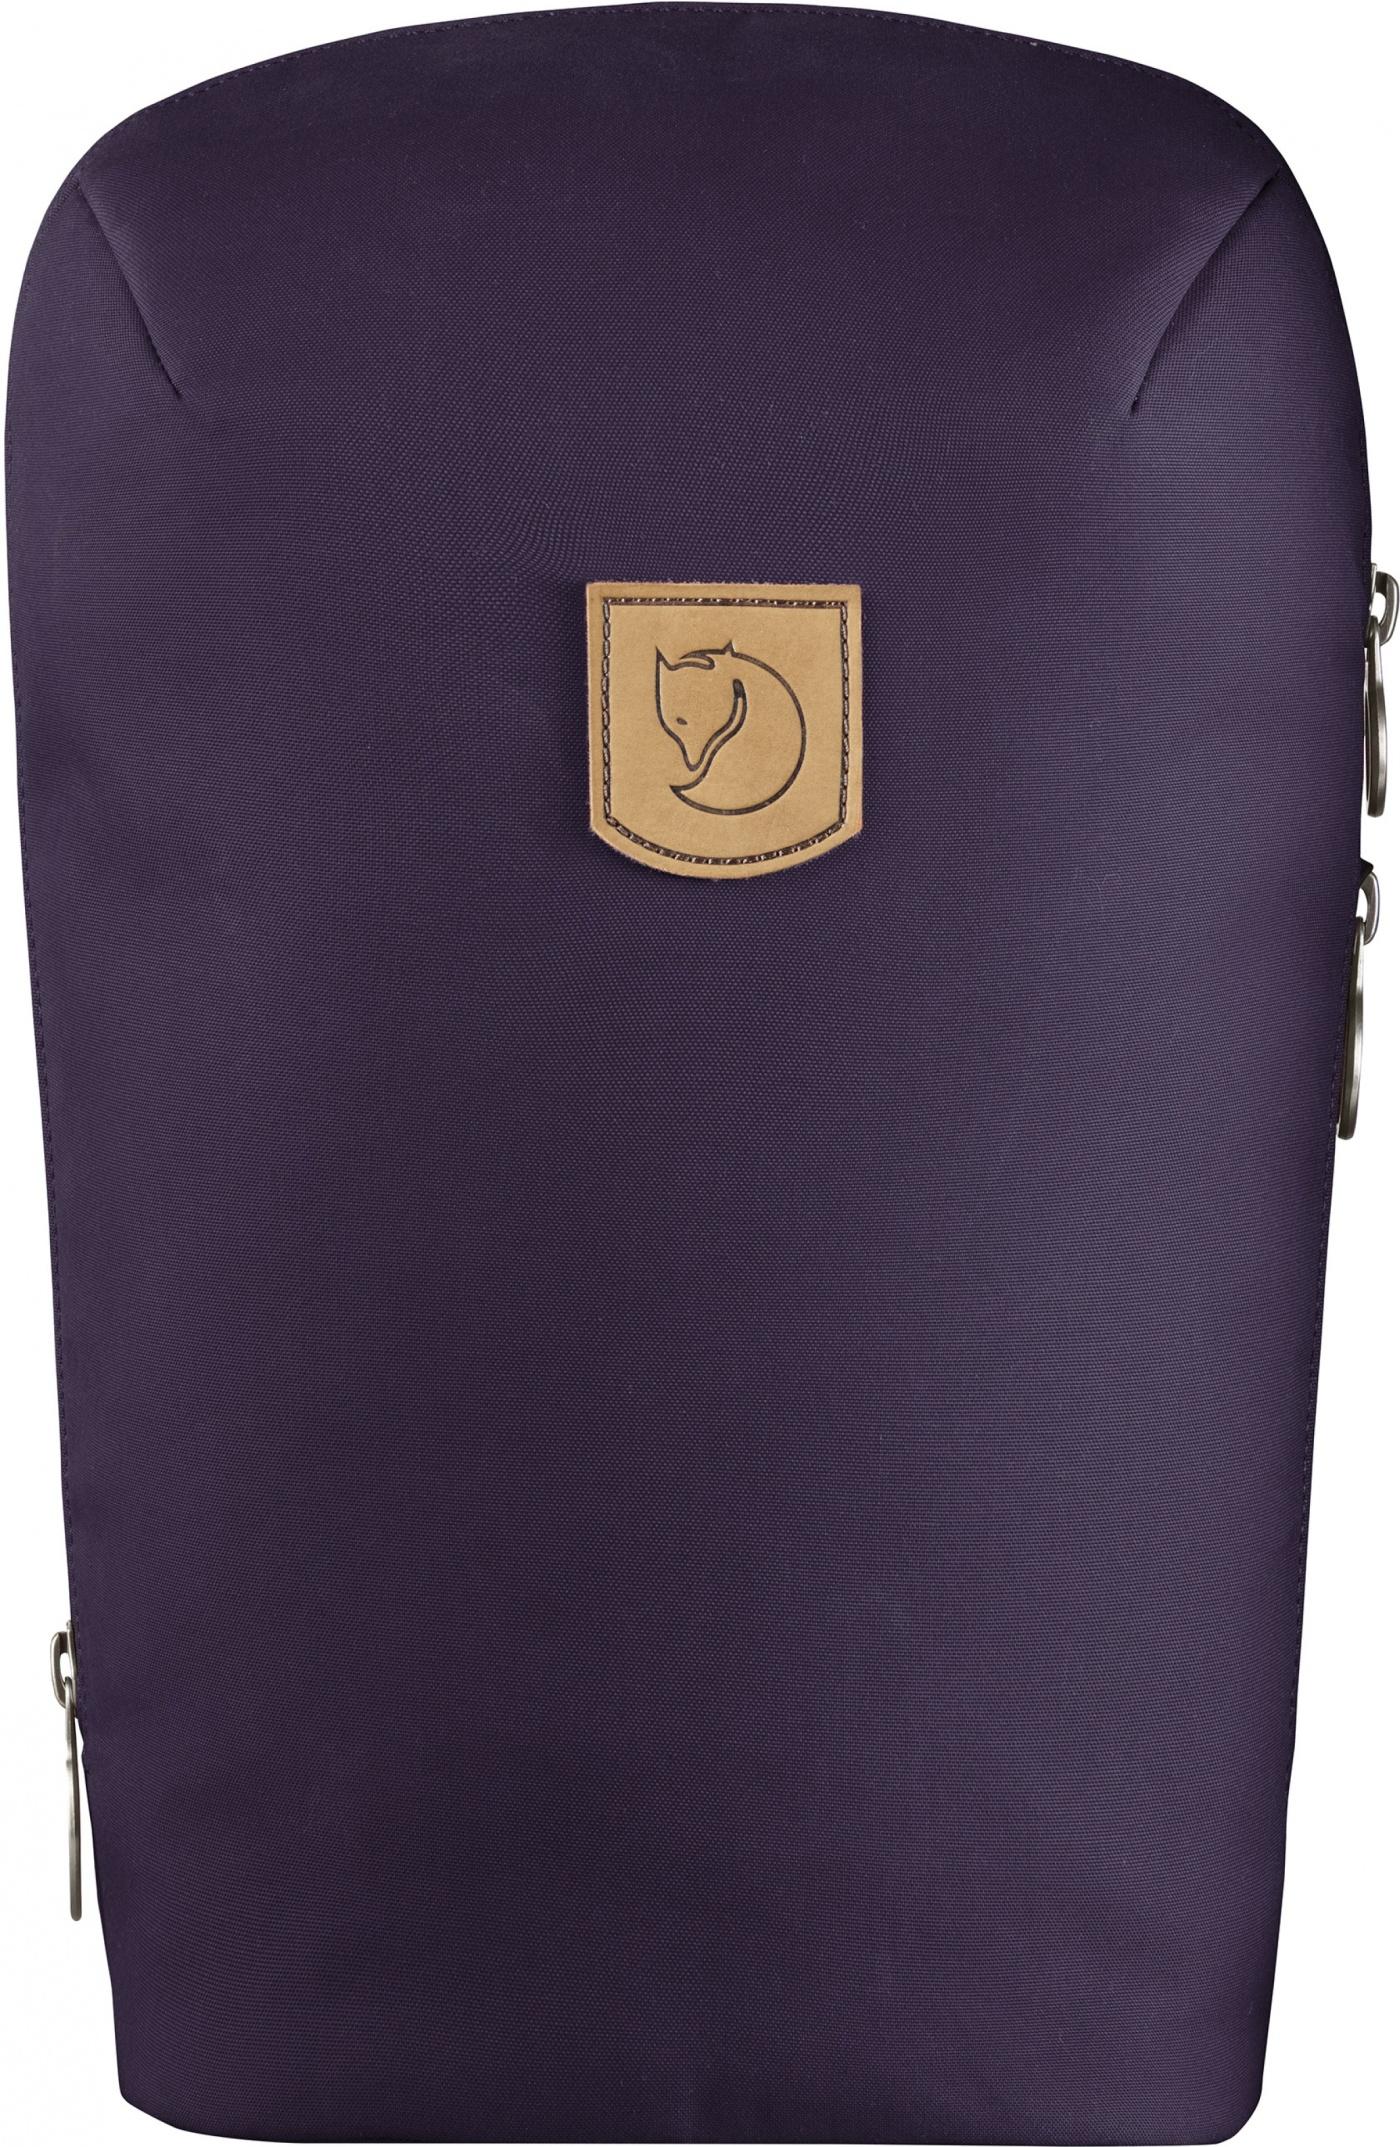 FjallRaven Kiruna Backpack Alpine Purple-30